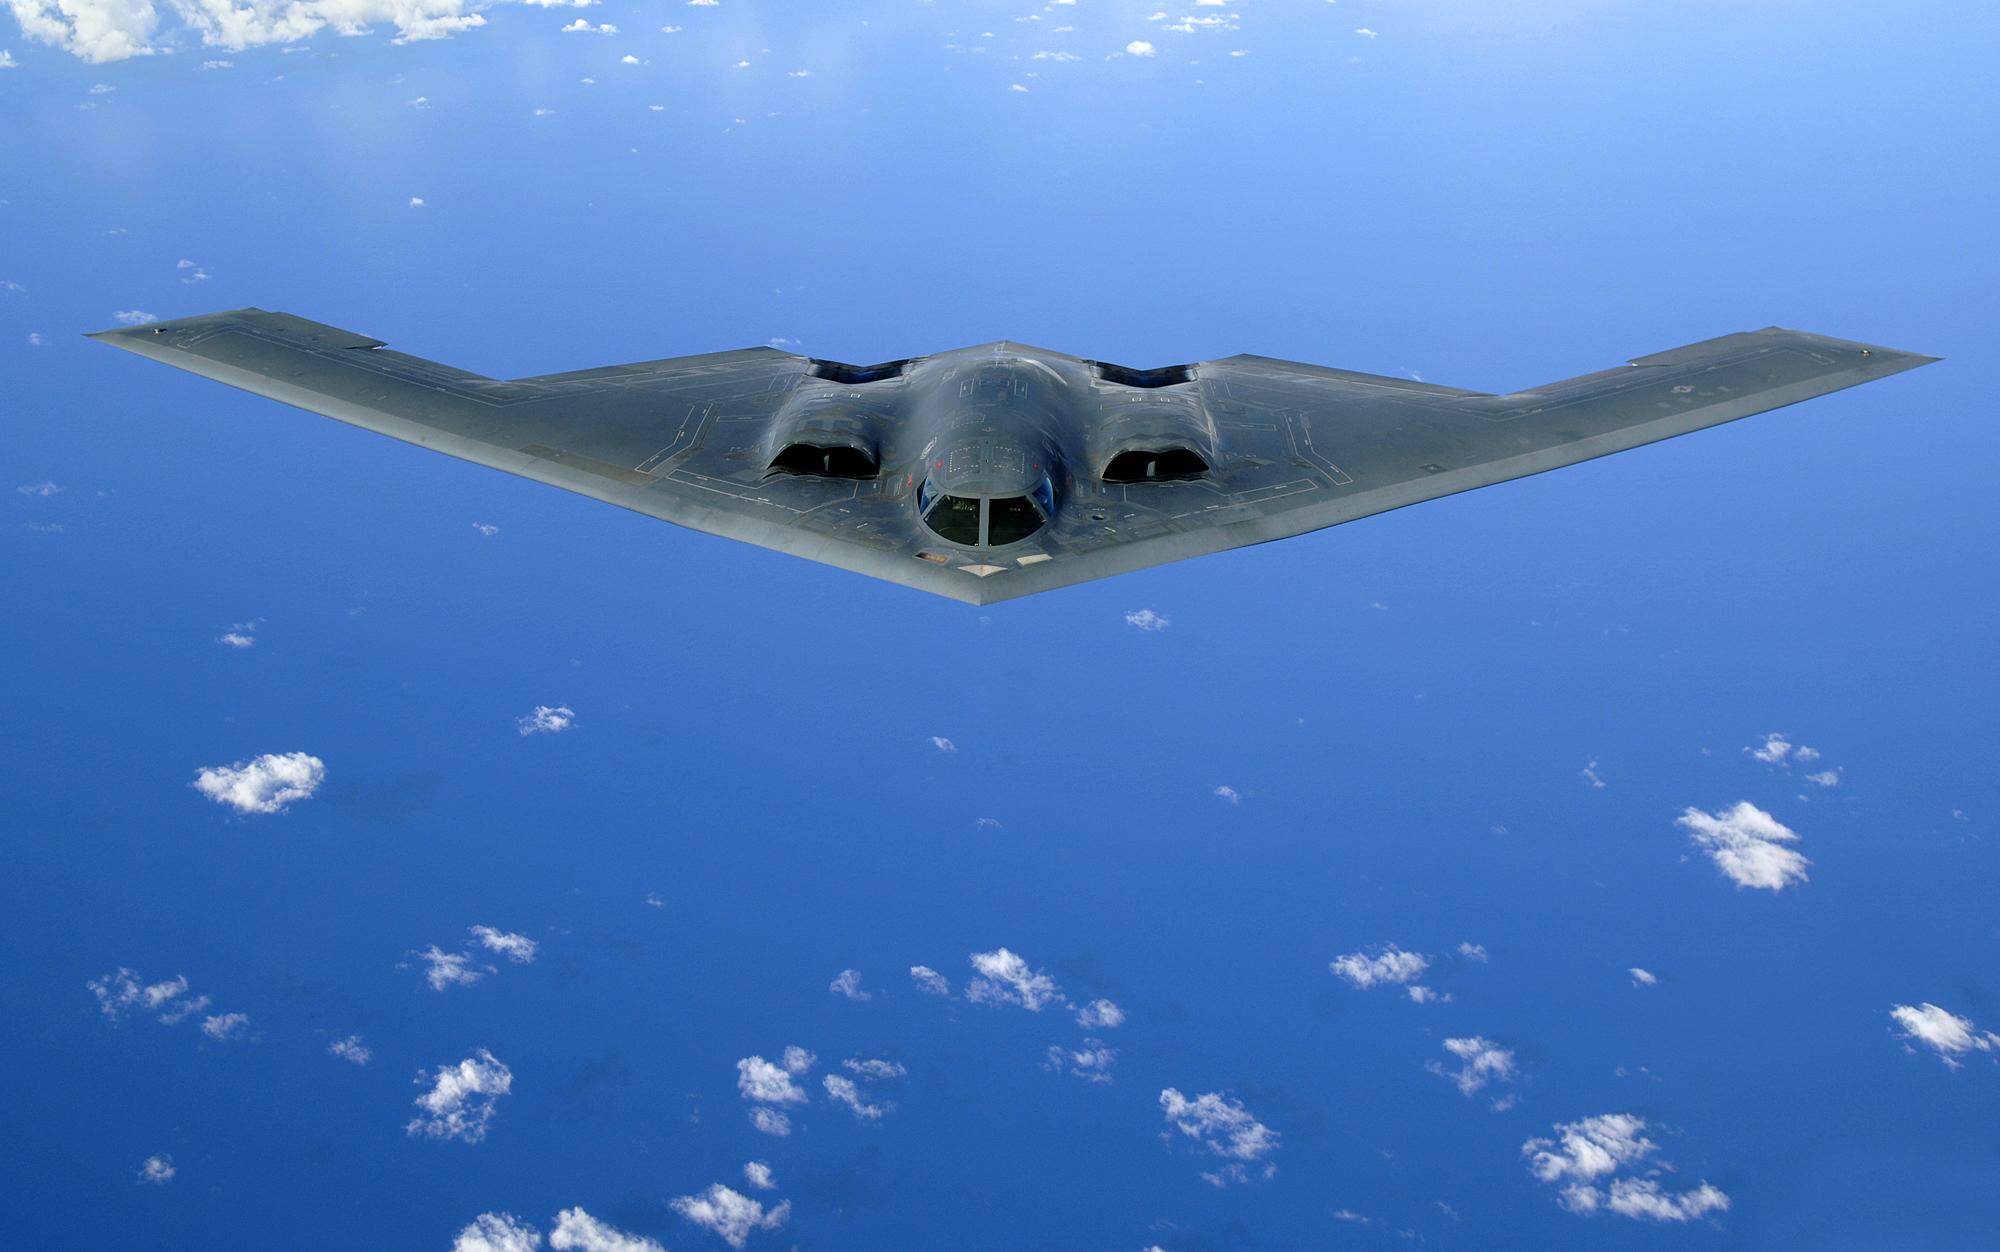 Бомбардировщик-невидимка B-2